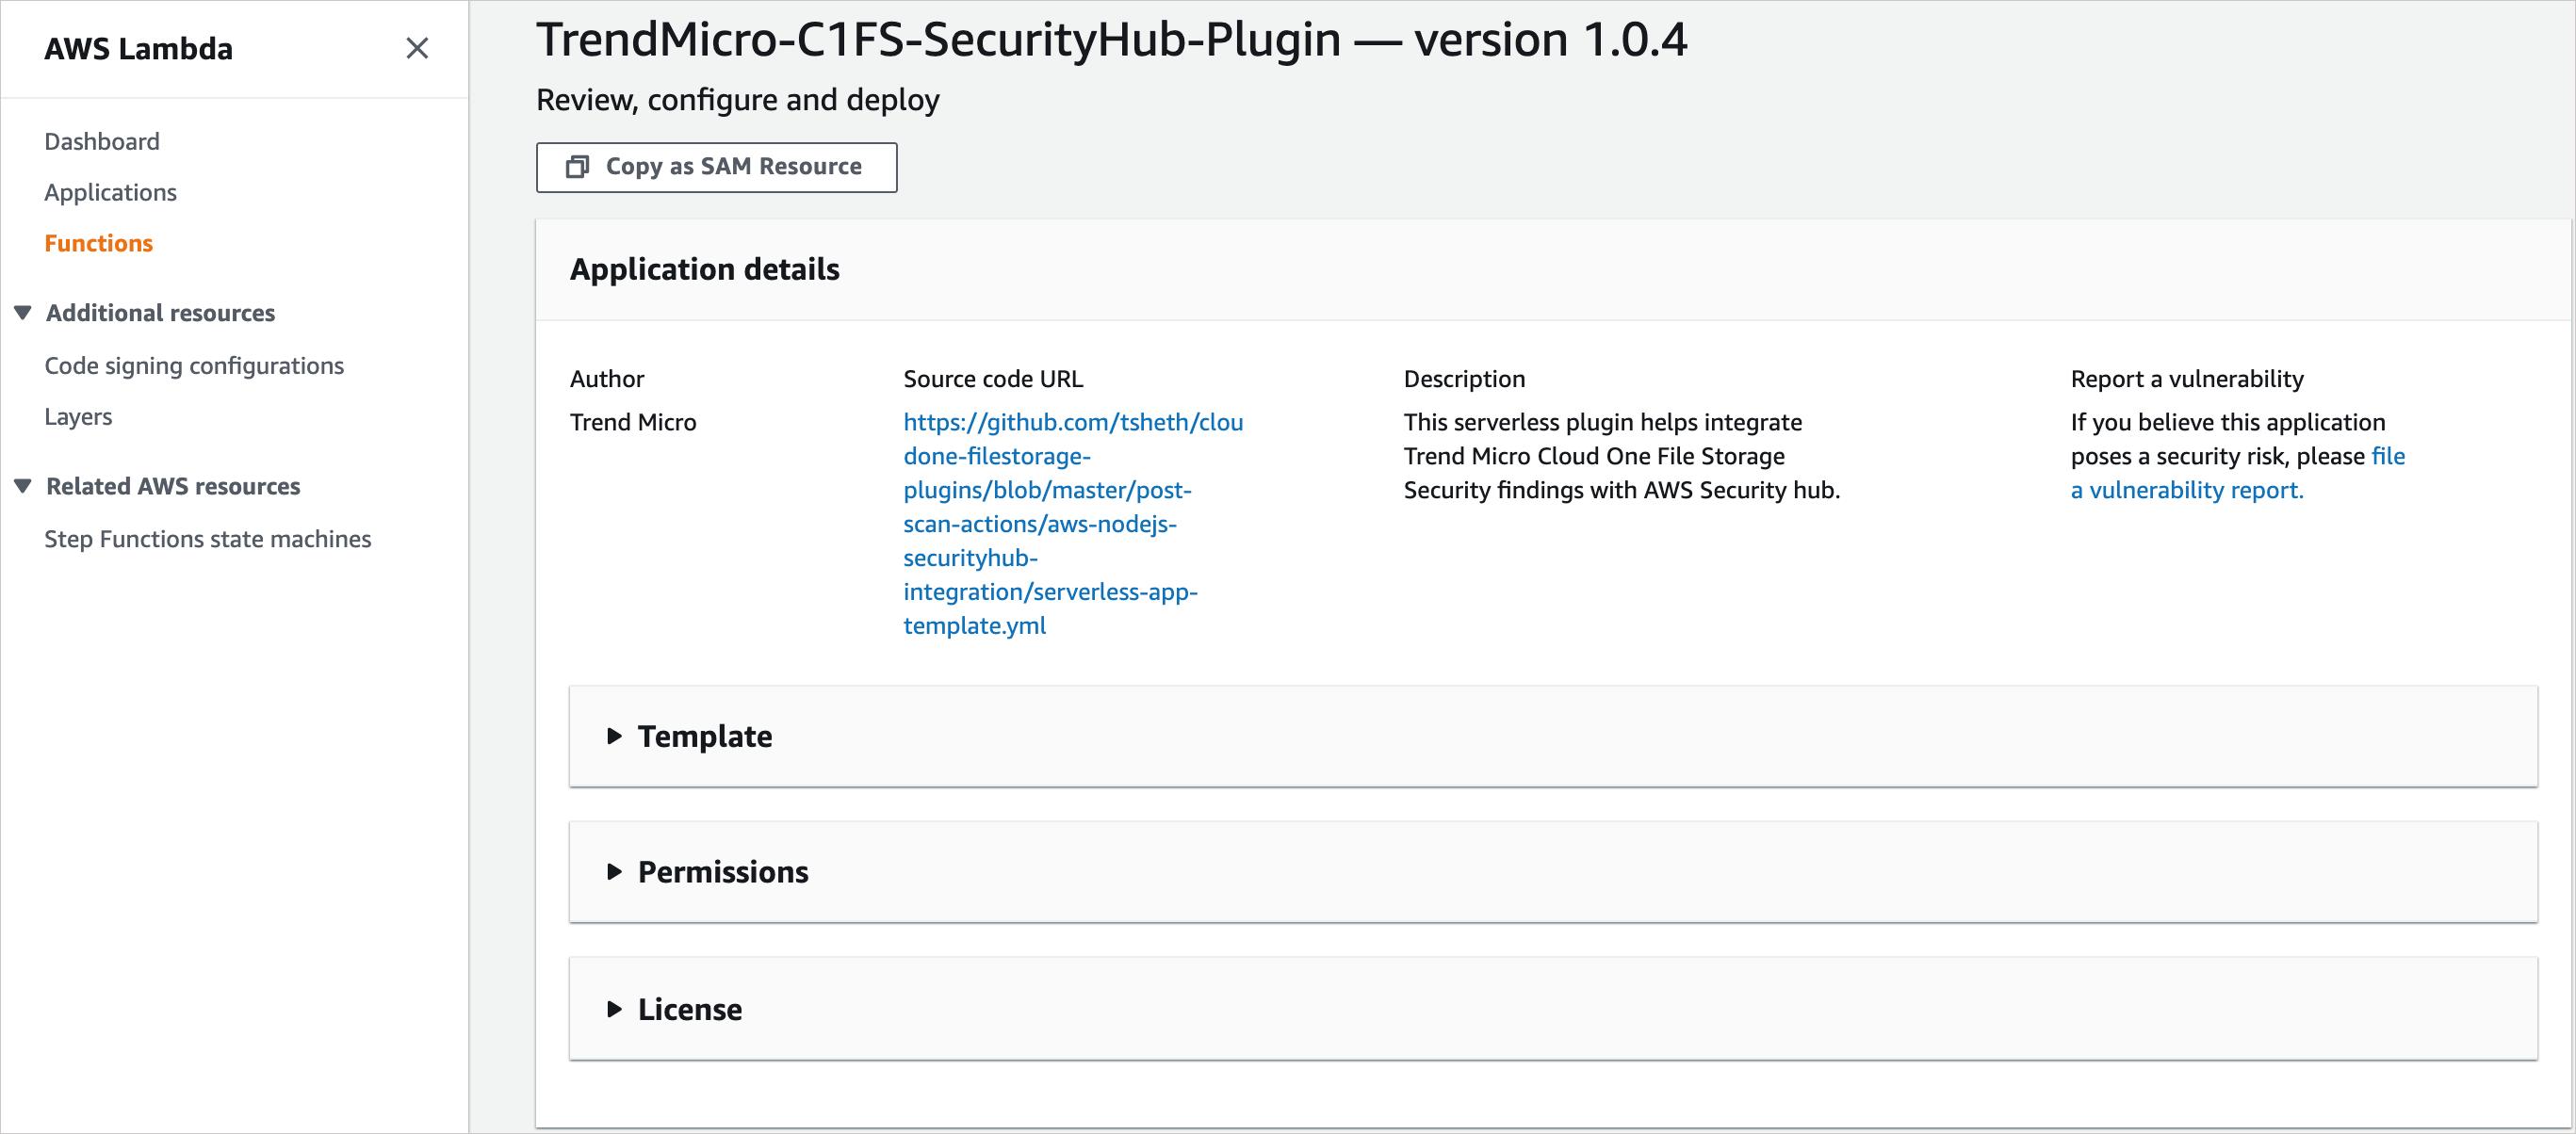 Figure 3 – Cloud One File Storage Security Serverless Plugin for AWS Security Hub.